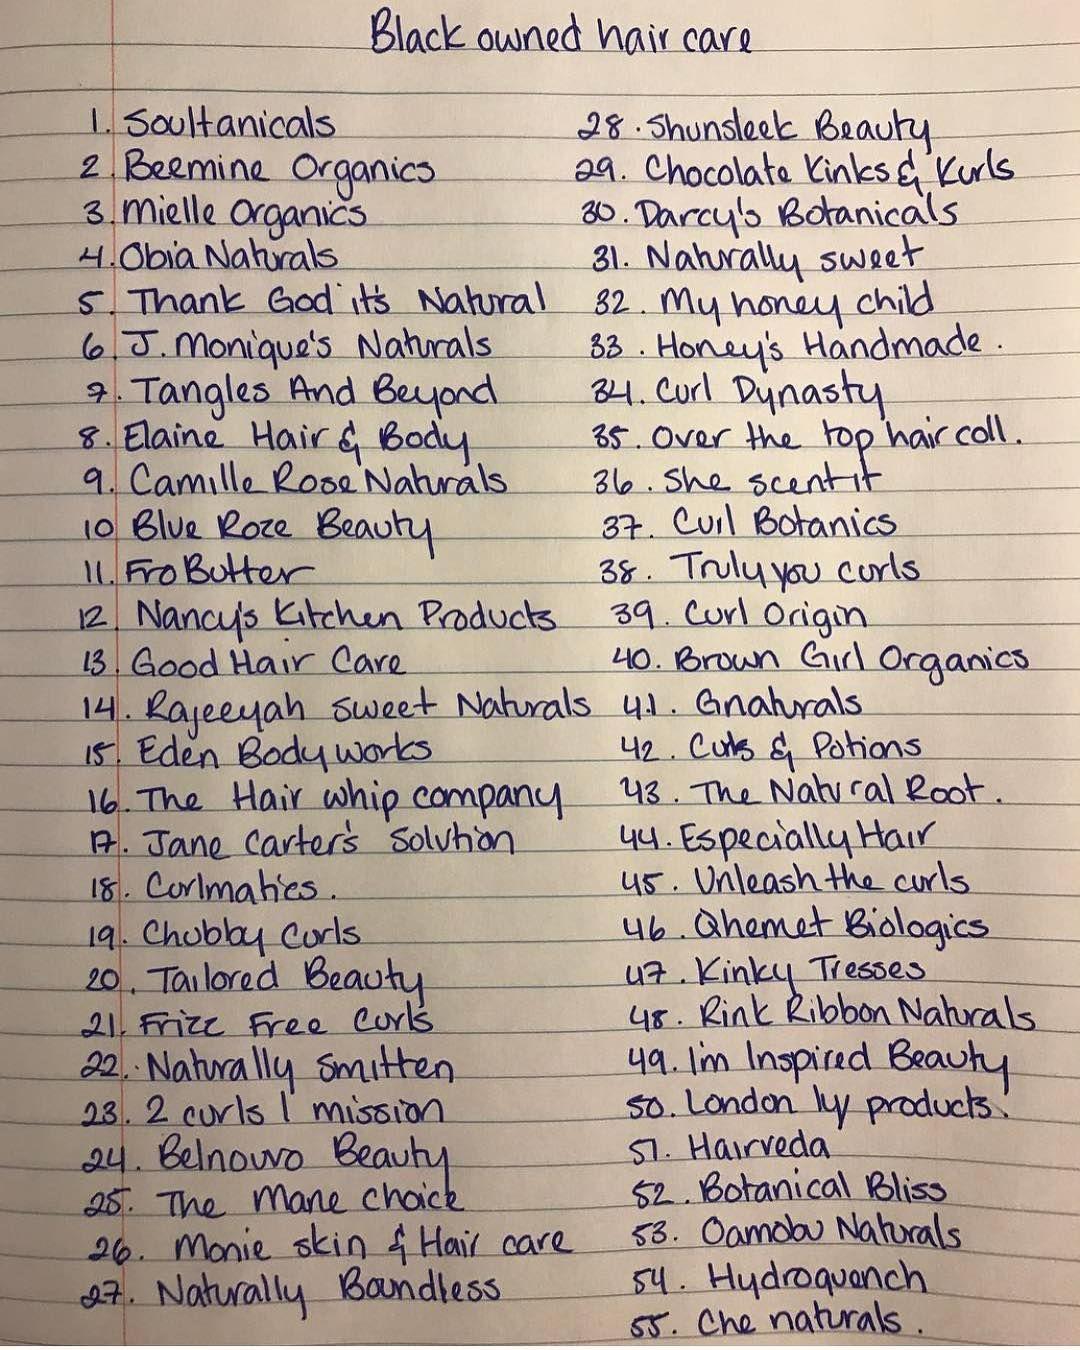 BigChopBeauty queenelizabette___ compiled a list of